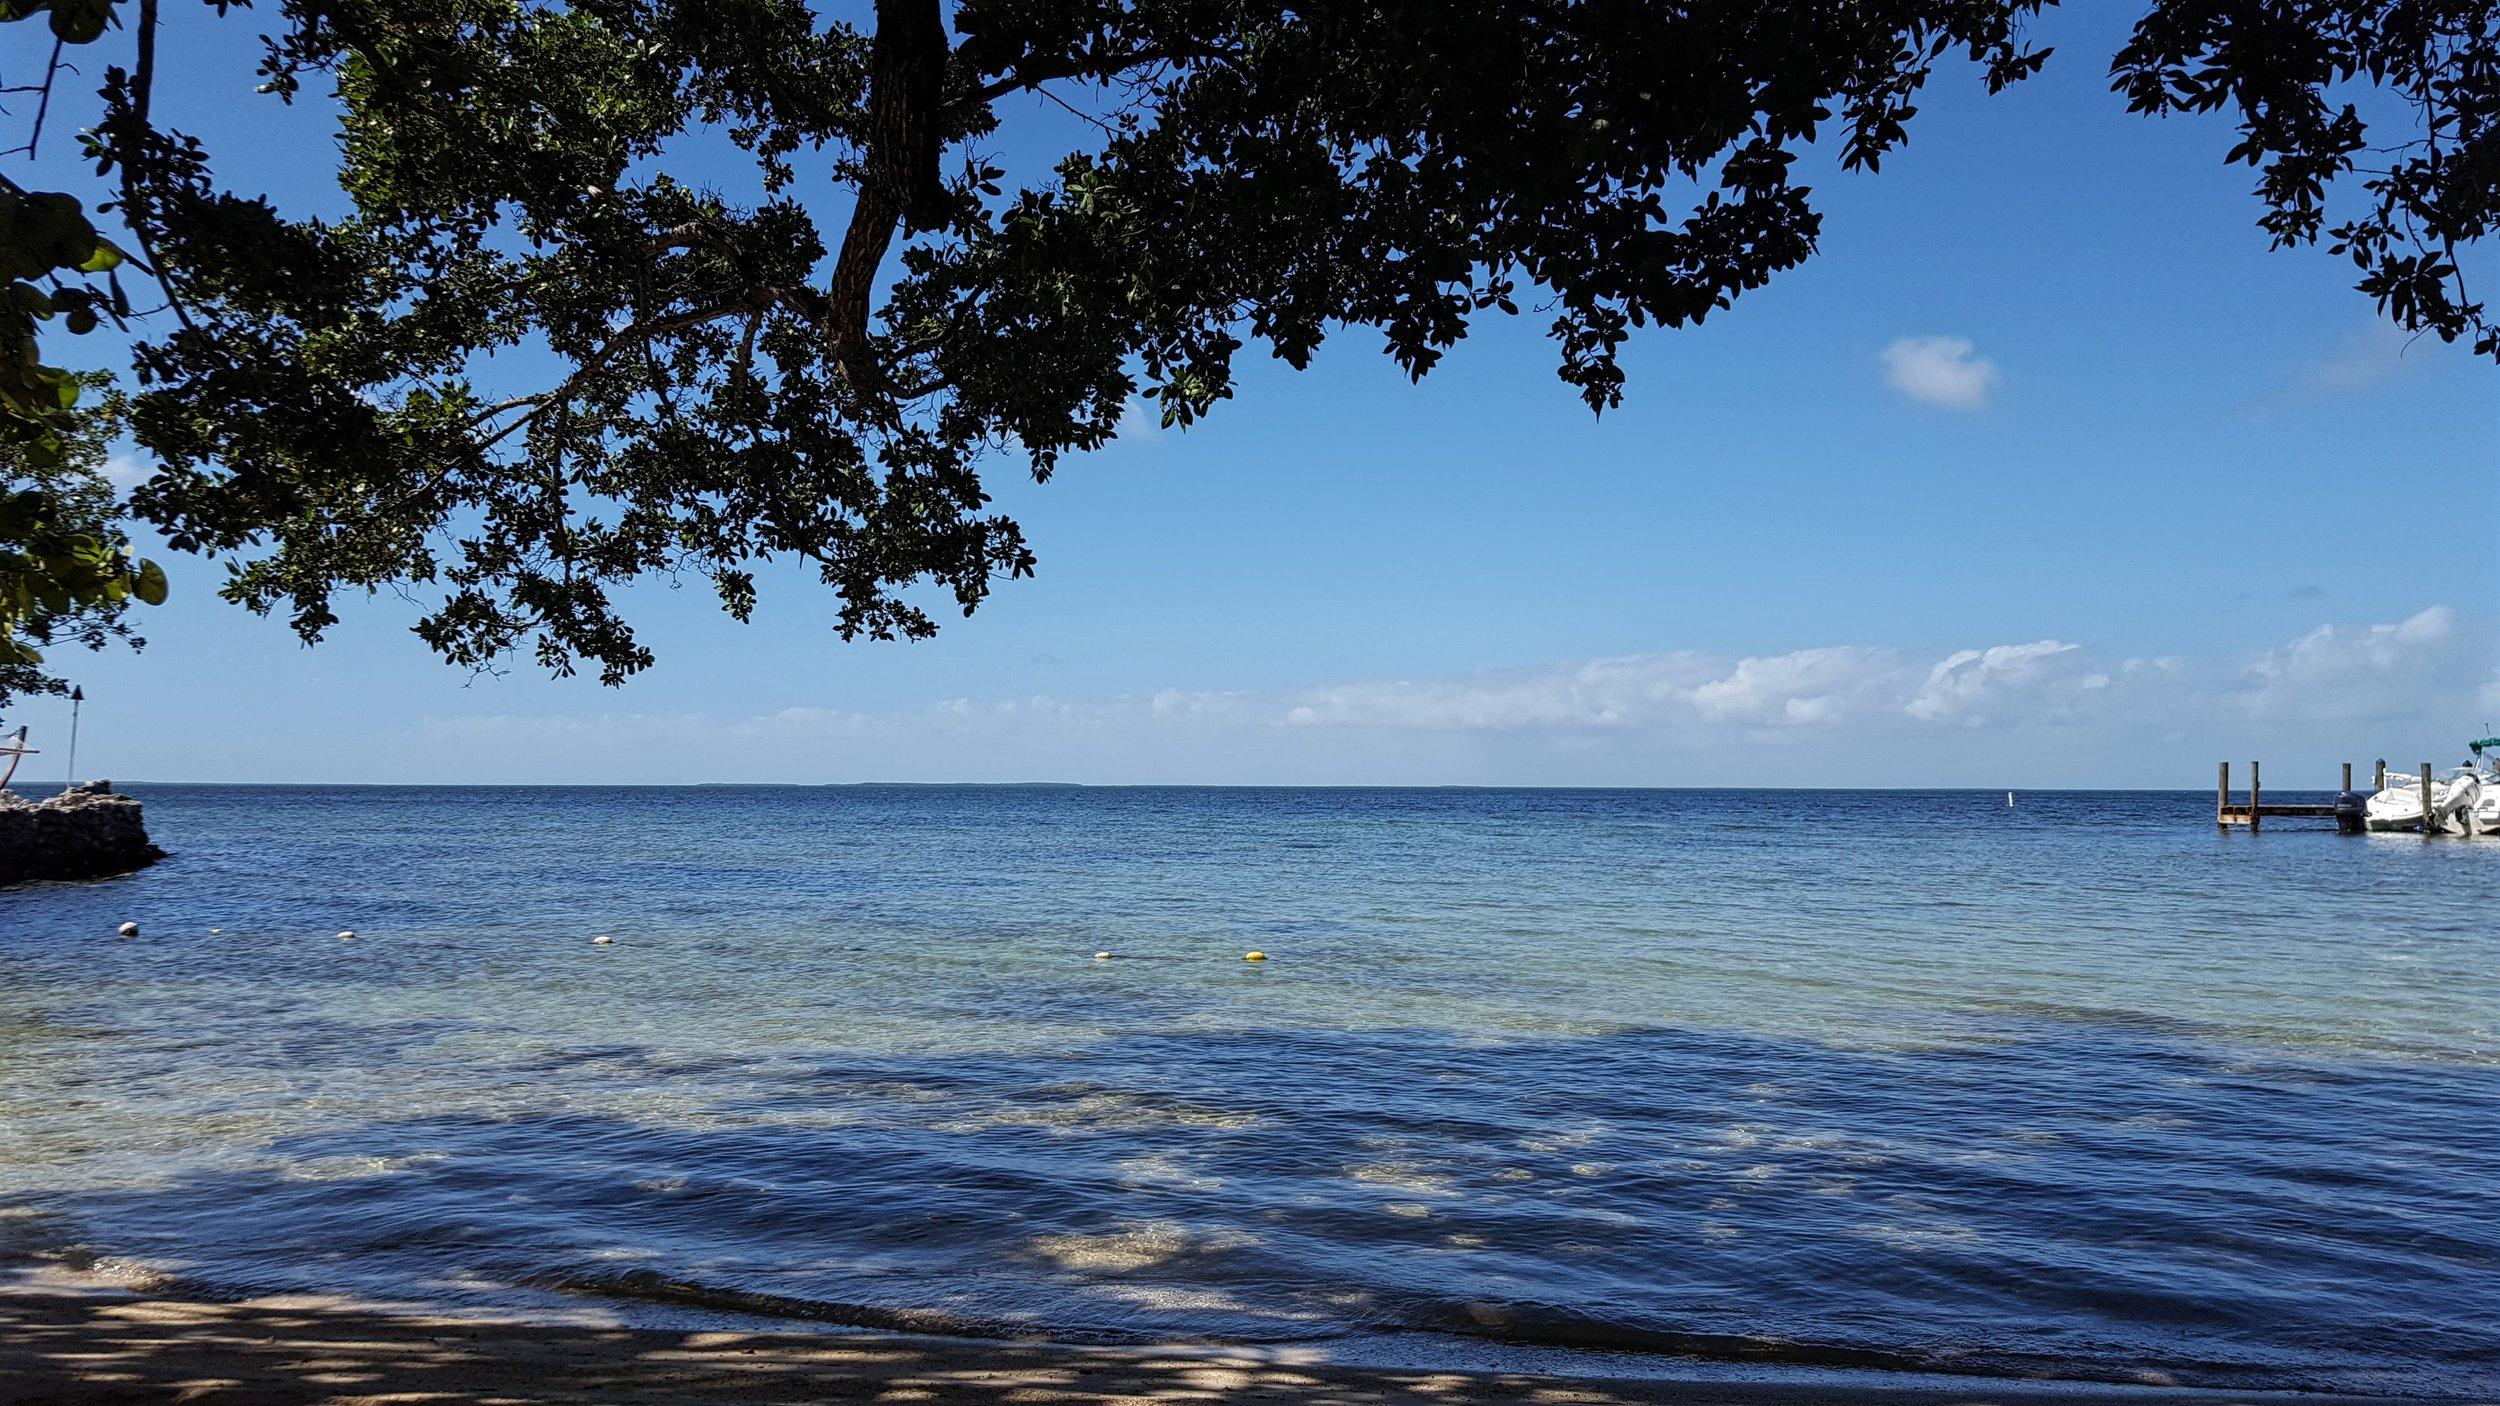 Beach at Marker 88